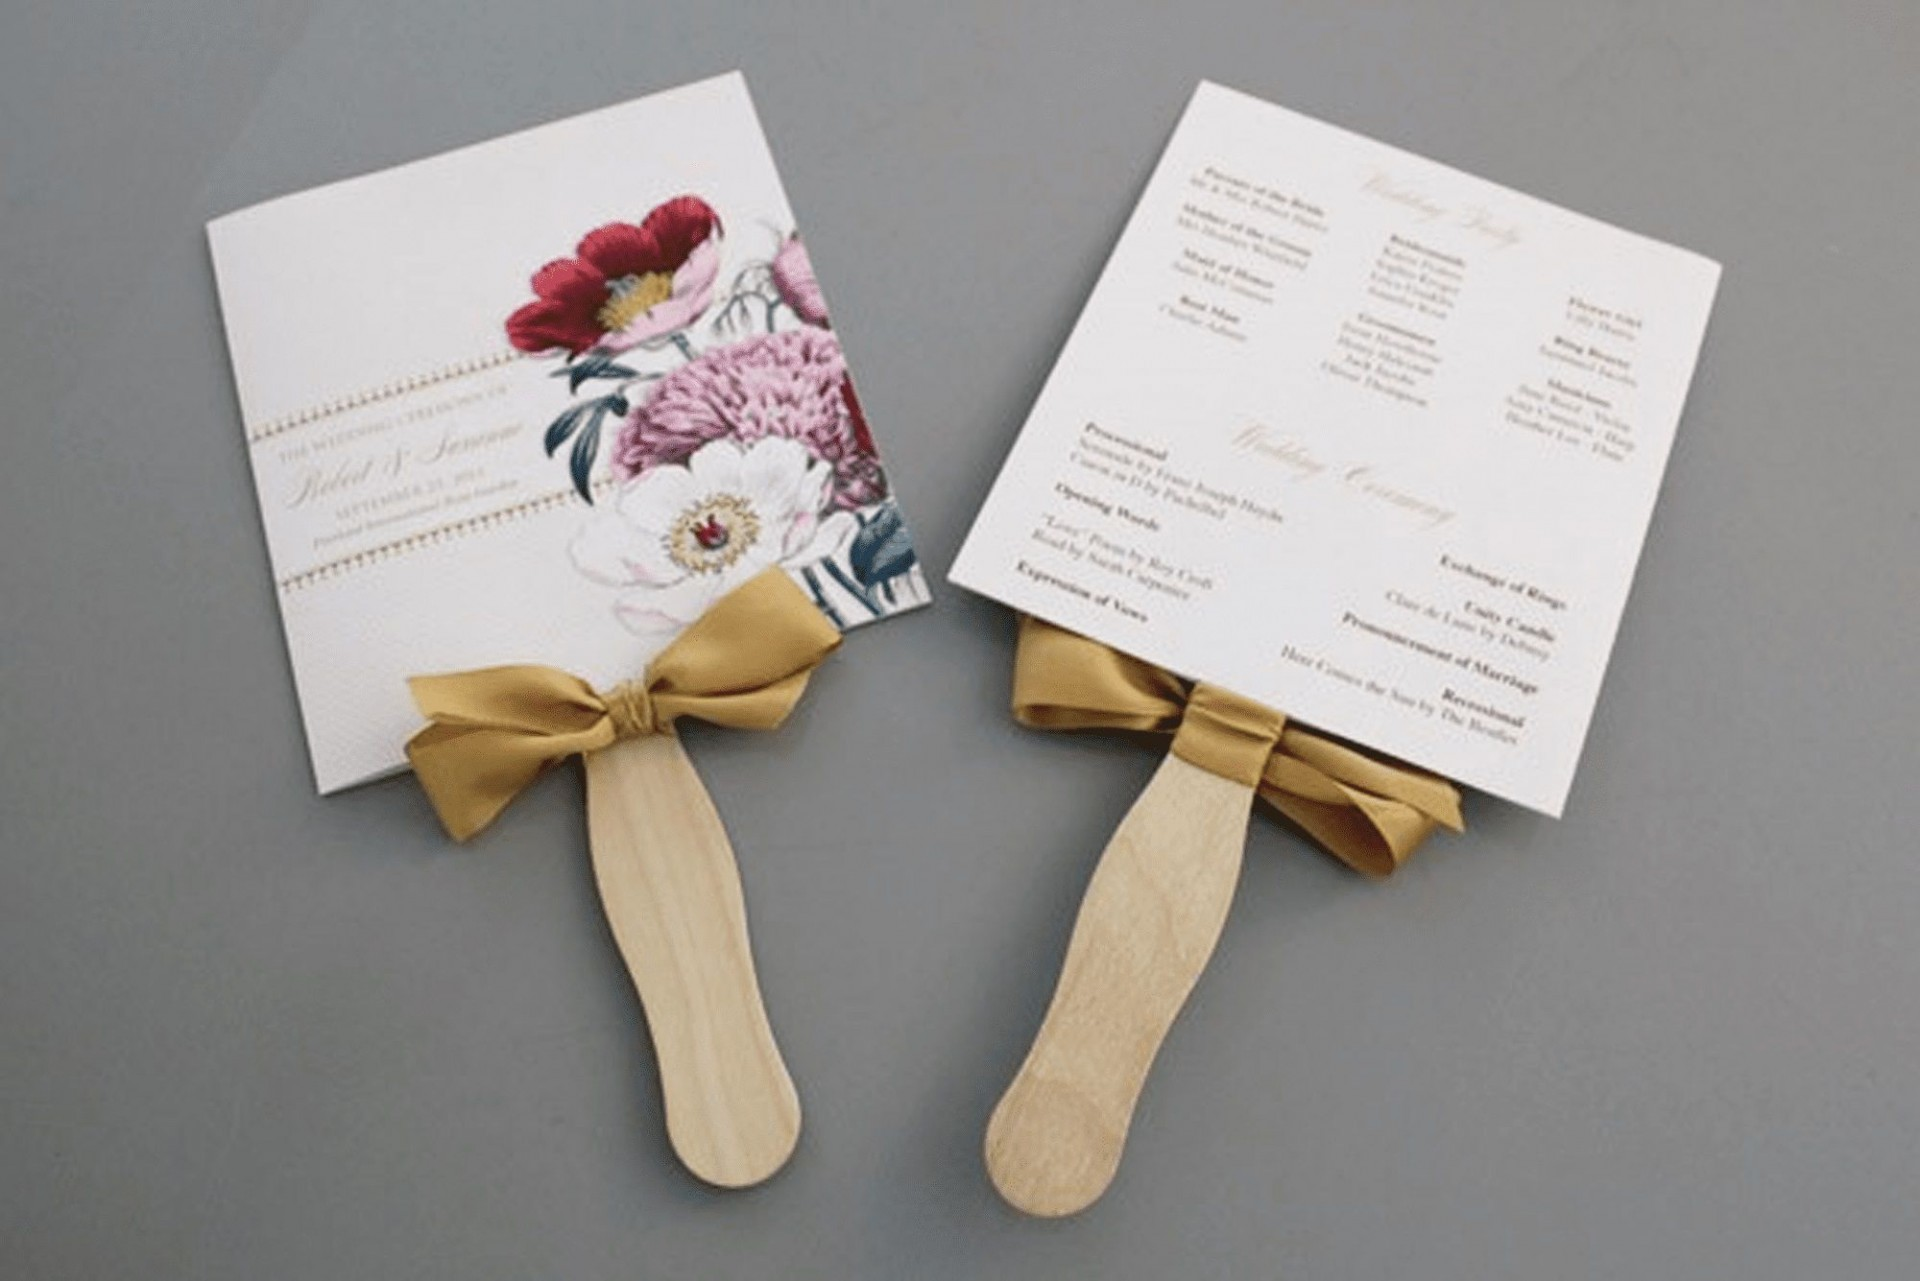 009 Marvelou Free Wedding Program Fan Template High Def  Templates Printable Paddle Word1920